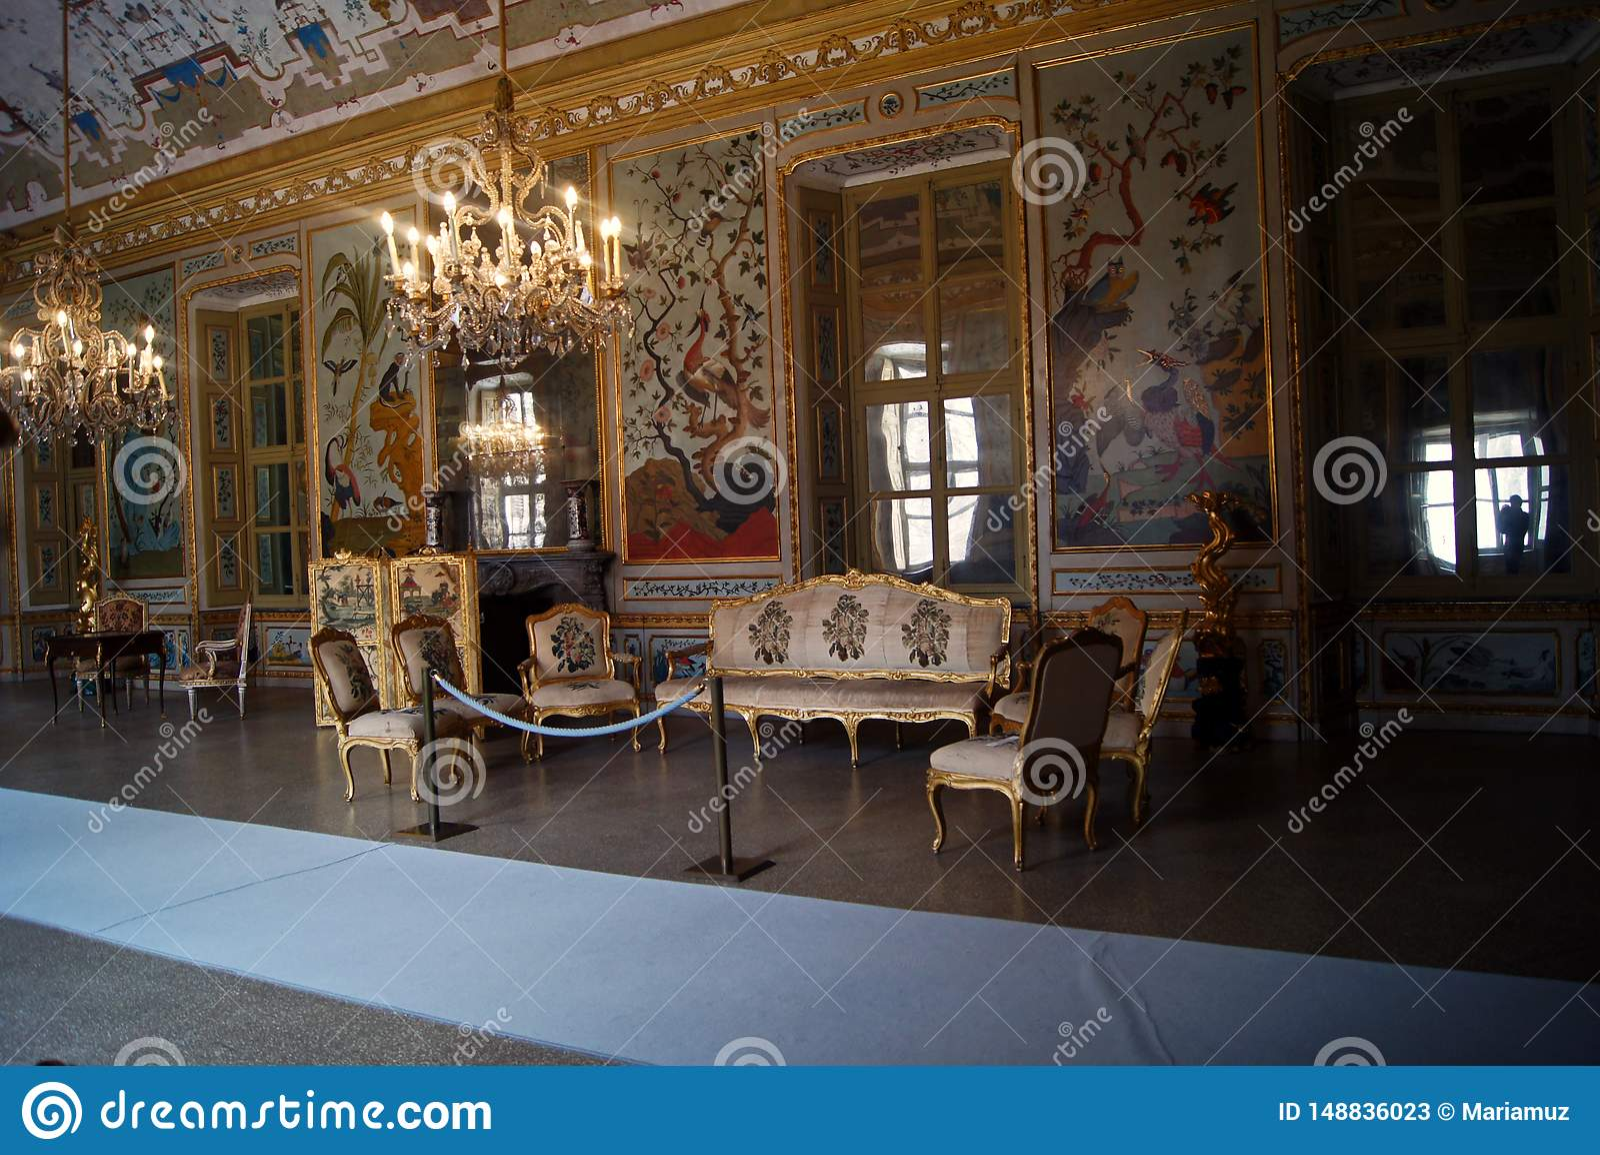 Stupinigi-ιαπωνικό δωμάτιο παλατιών της Ιταλίας, Τορίνο βασιλικό, gamming δωμάτιο